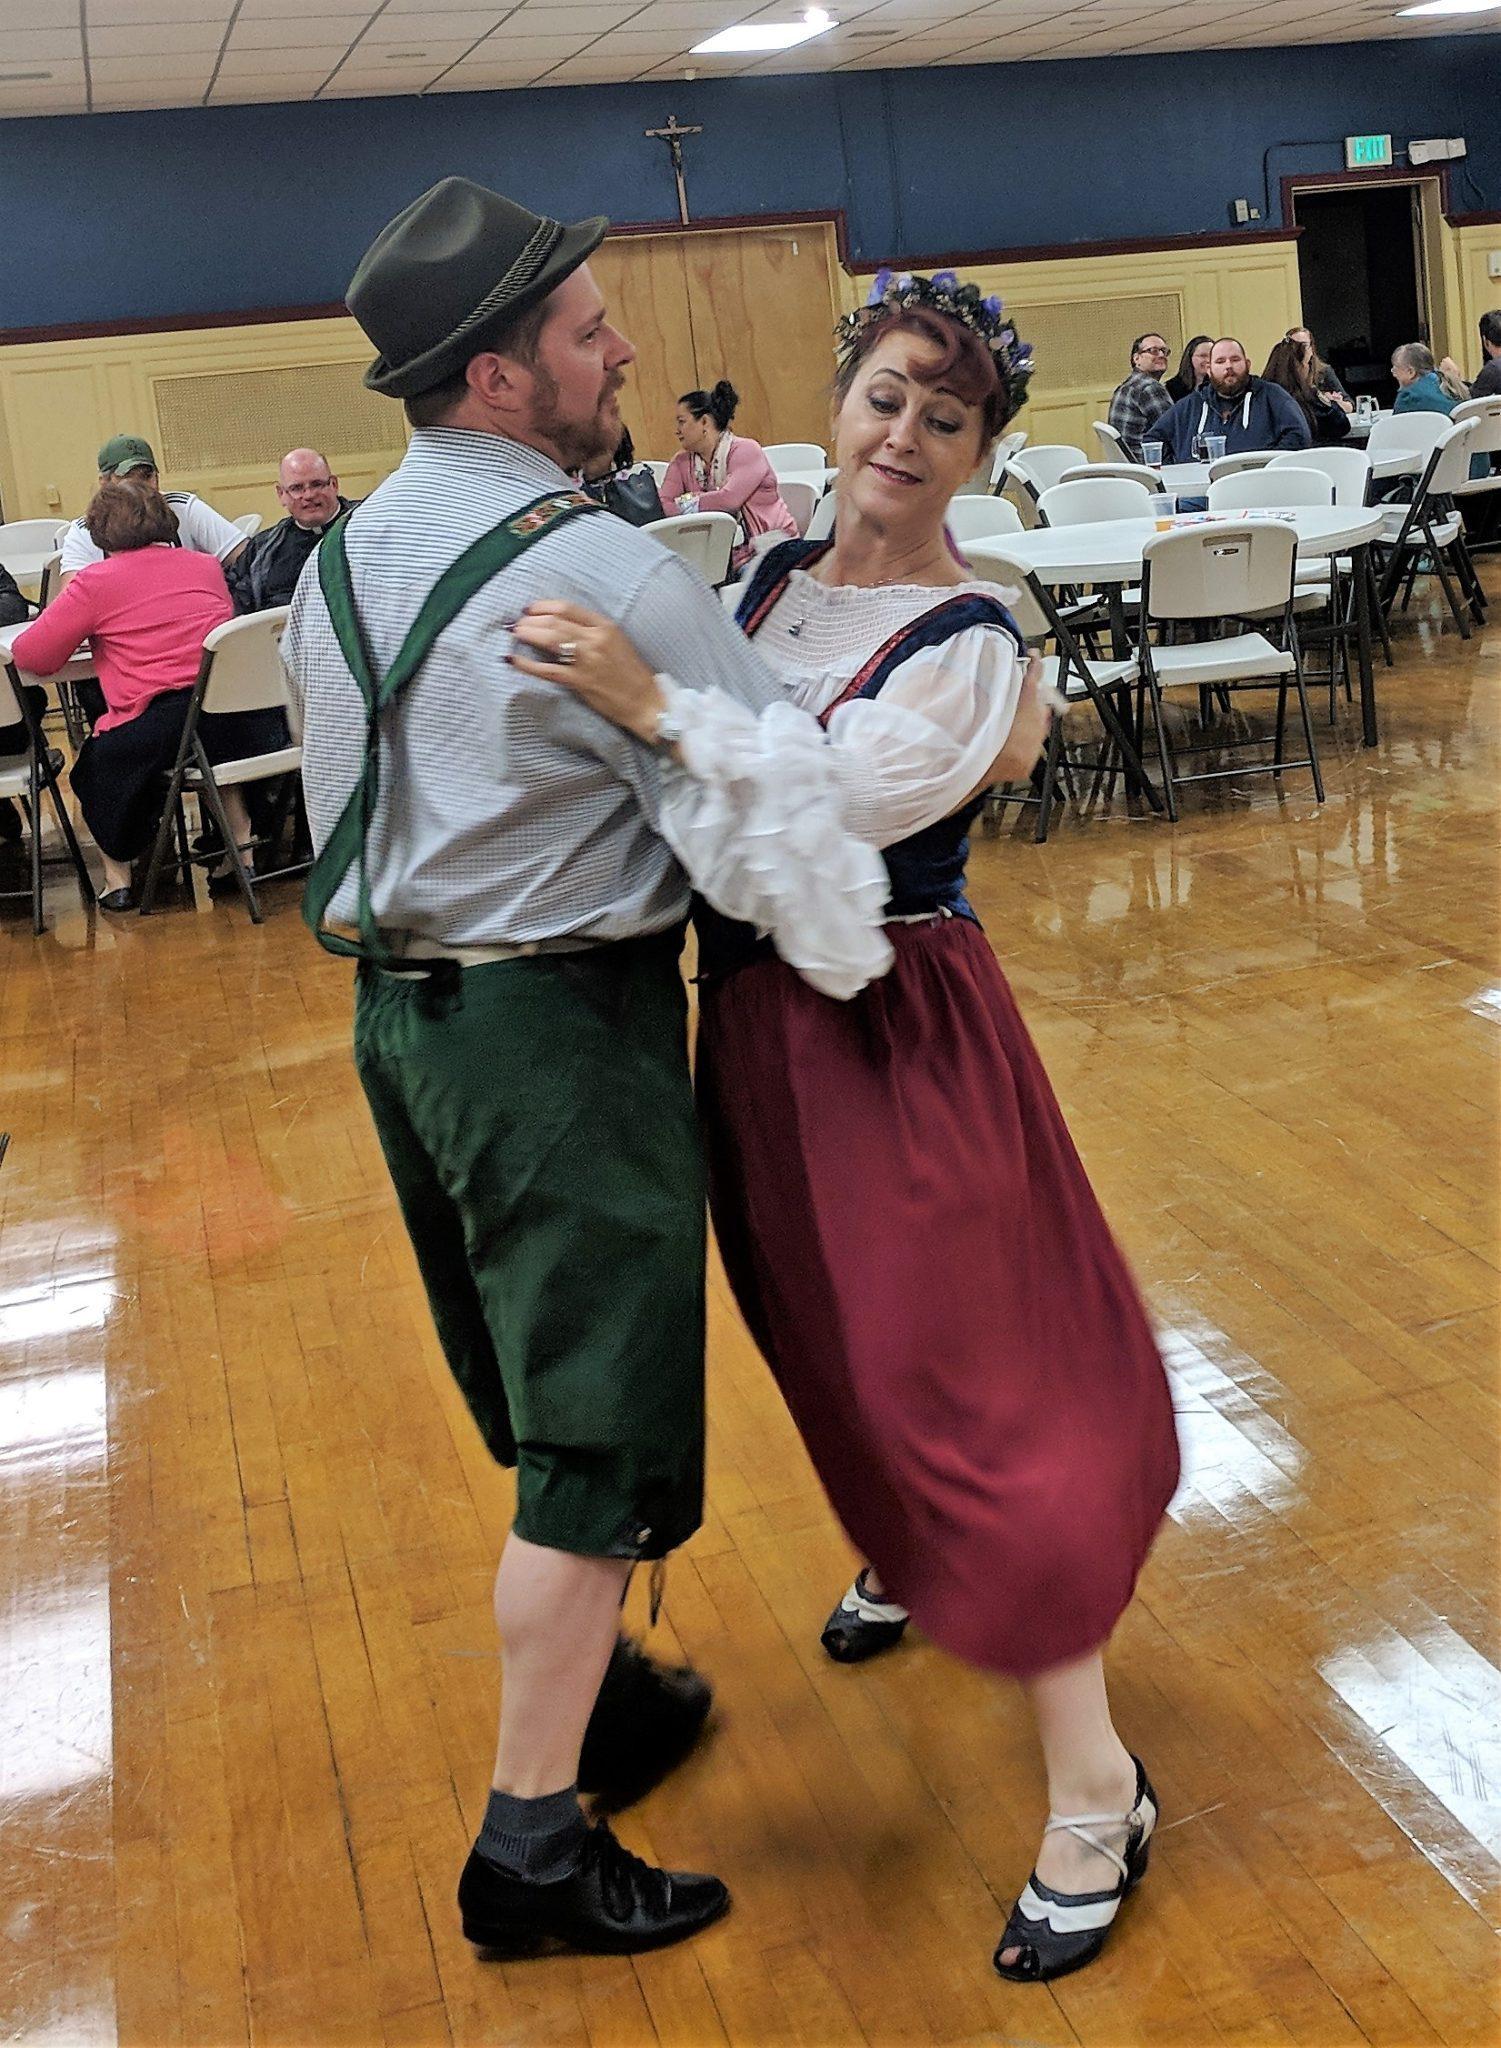 Oktoberfest-polka-dance.jpg